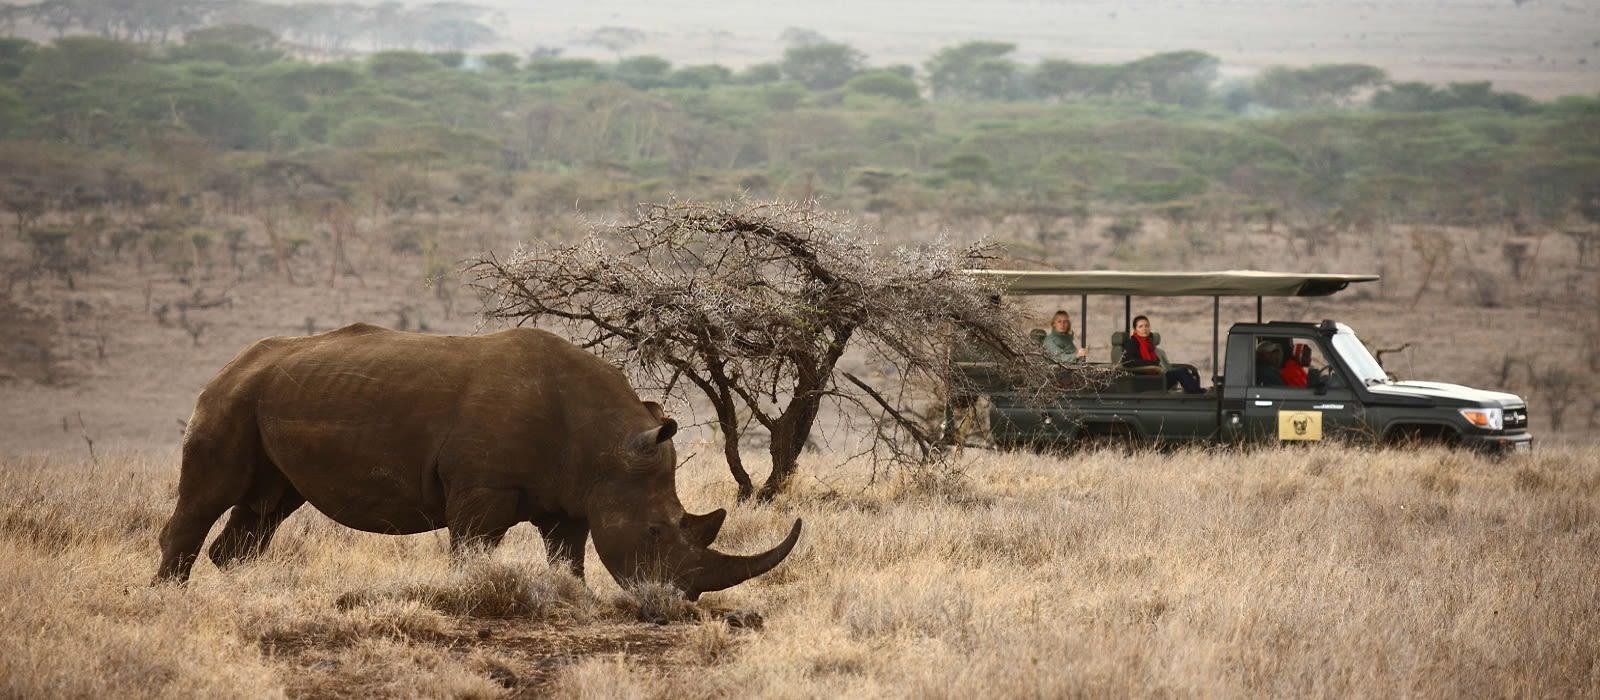 Kenia: Wandersafari & Strand Urlaub 2